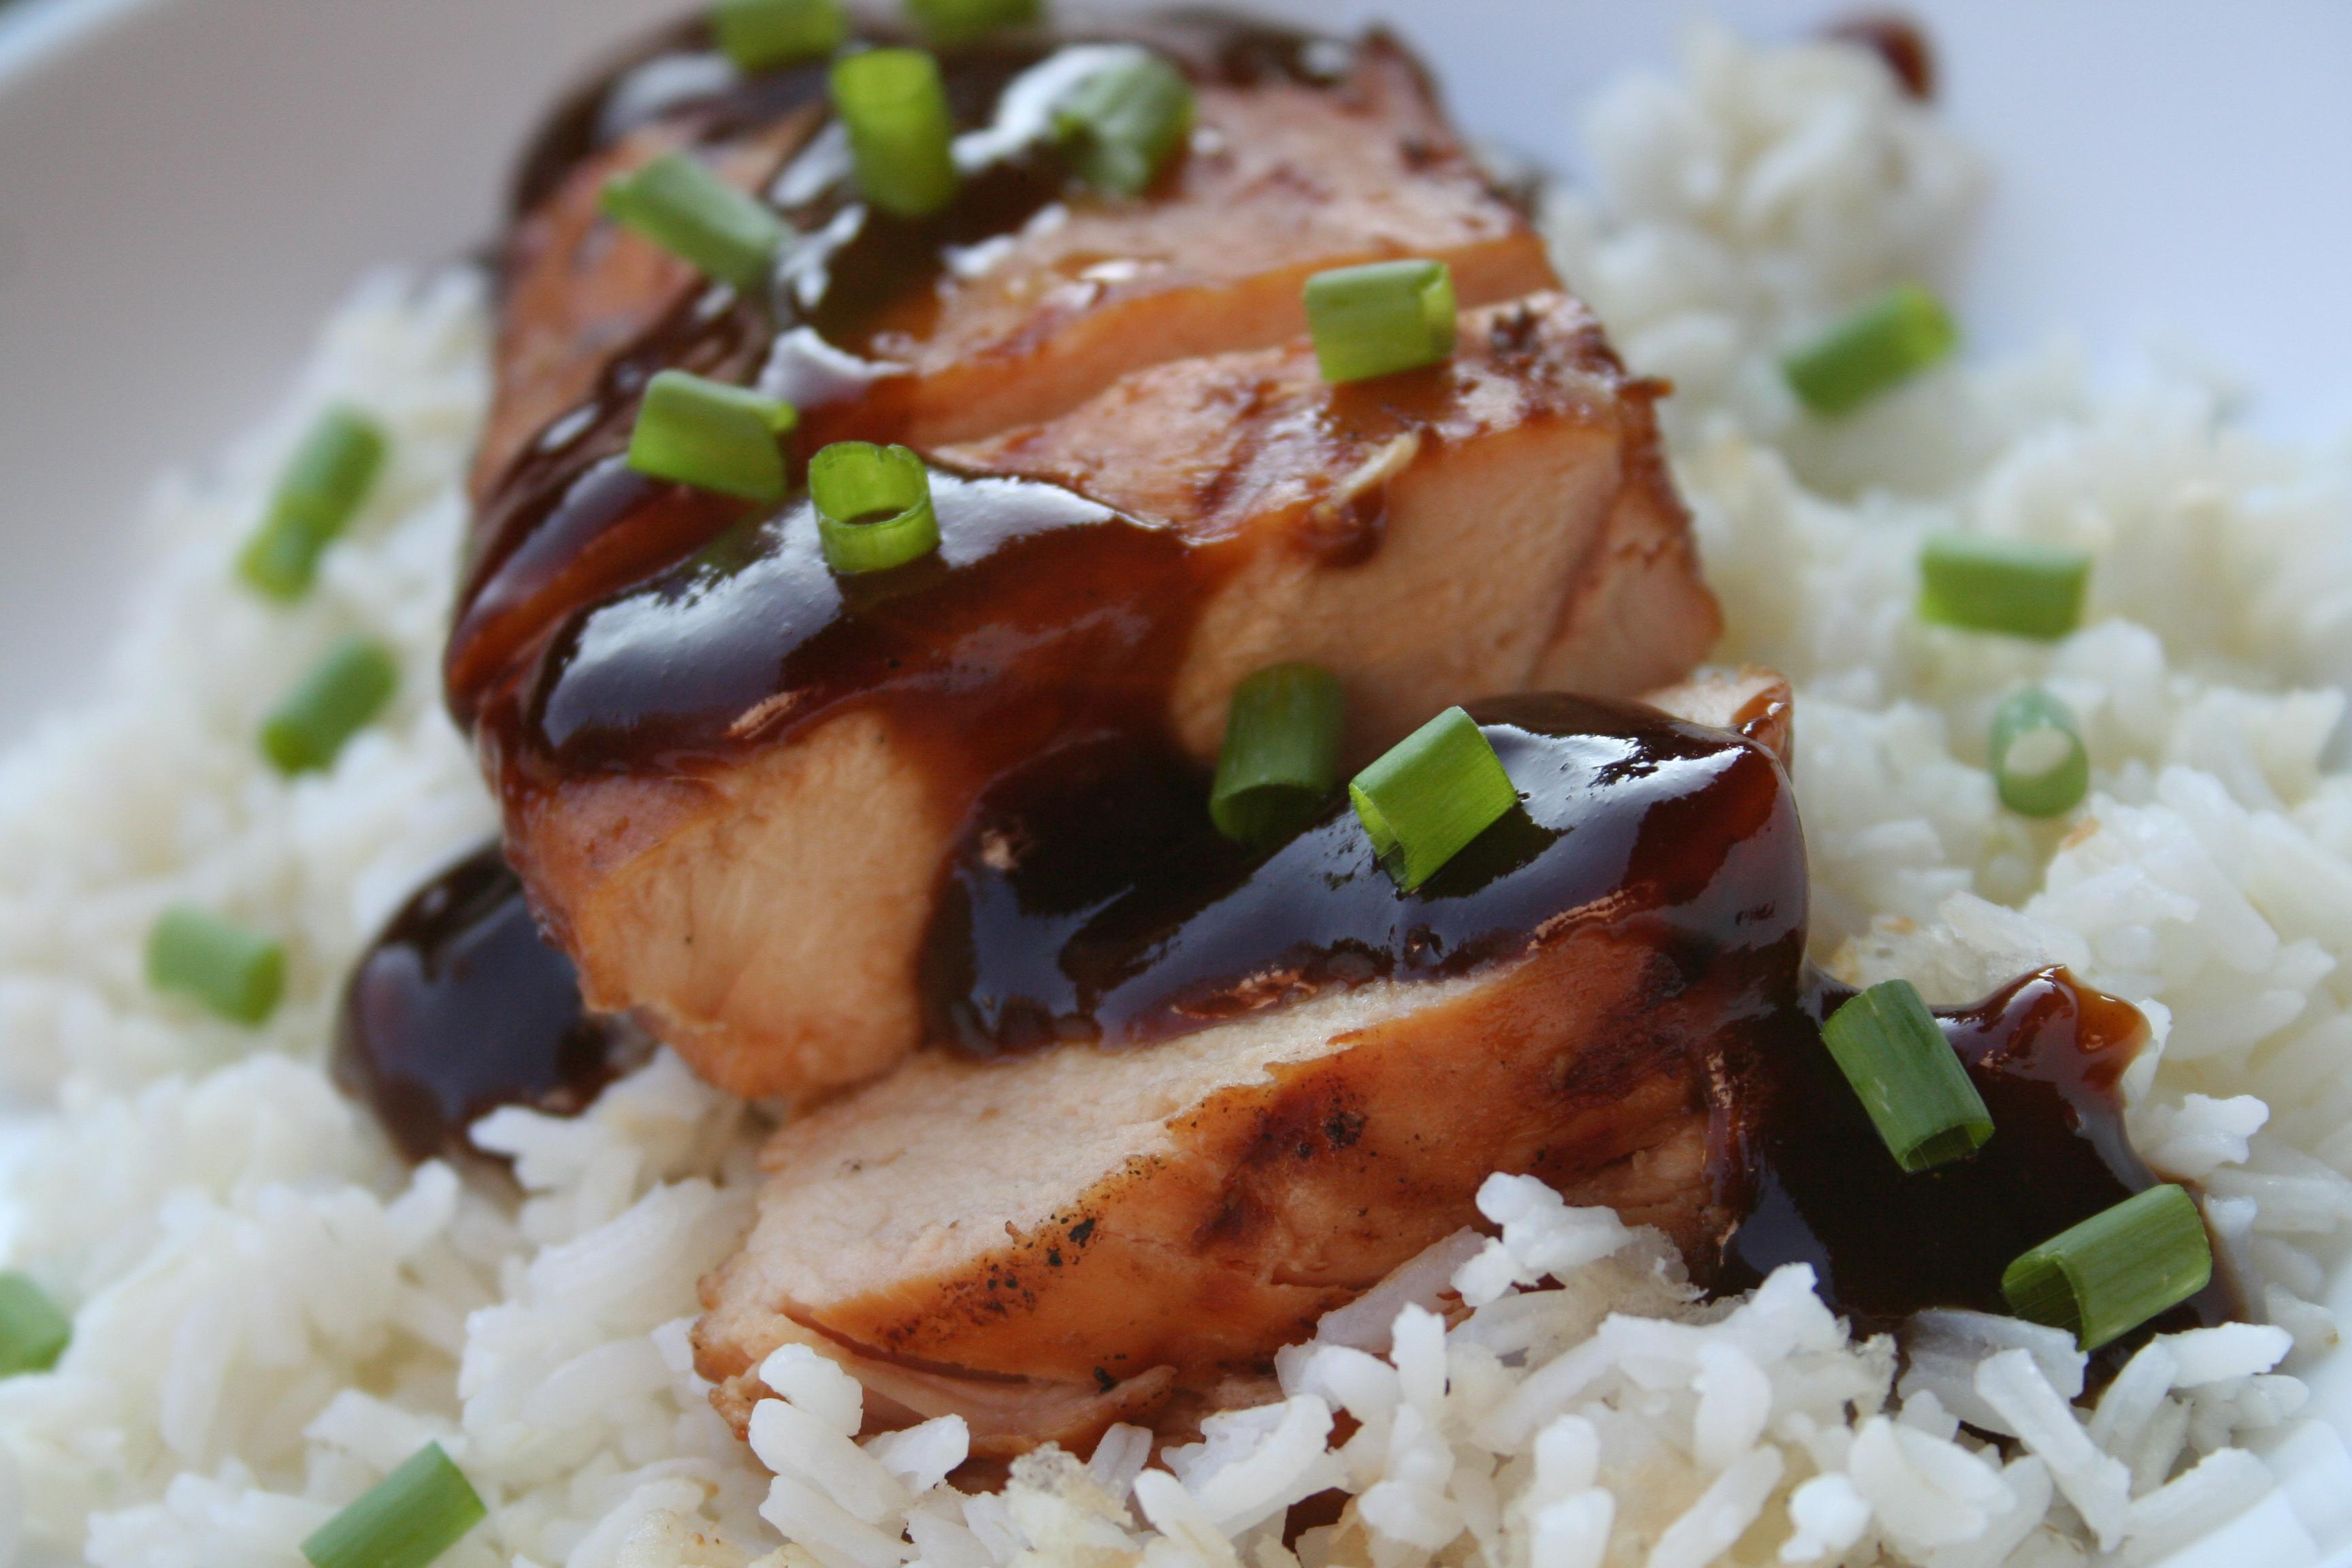 Grilled Teriyaki Chicken from Scratch